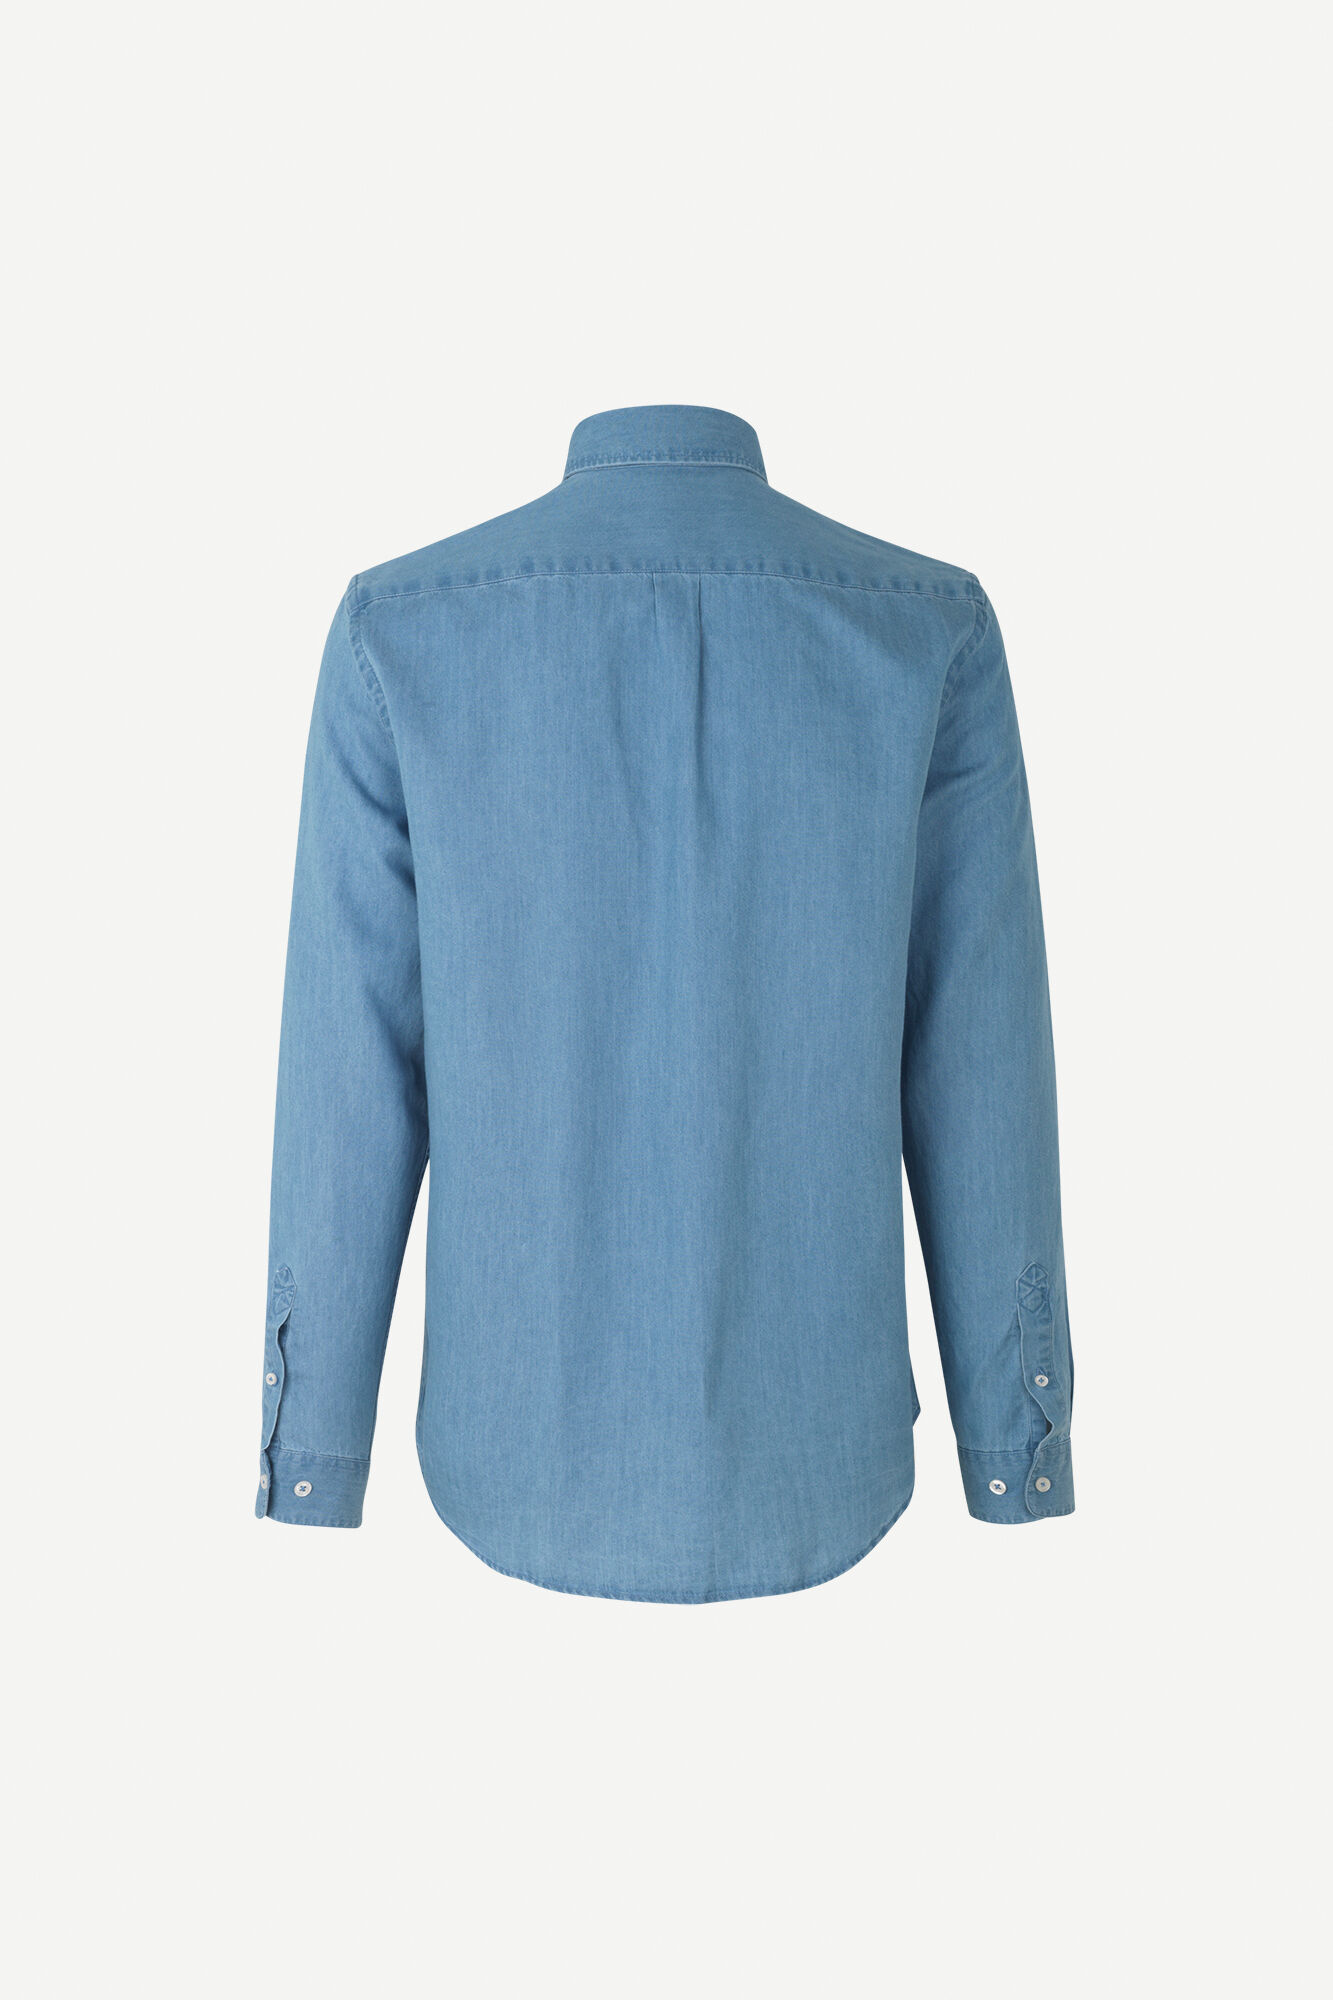 Liam BA Dream Blue Jeans Shirt-2